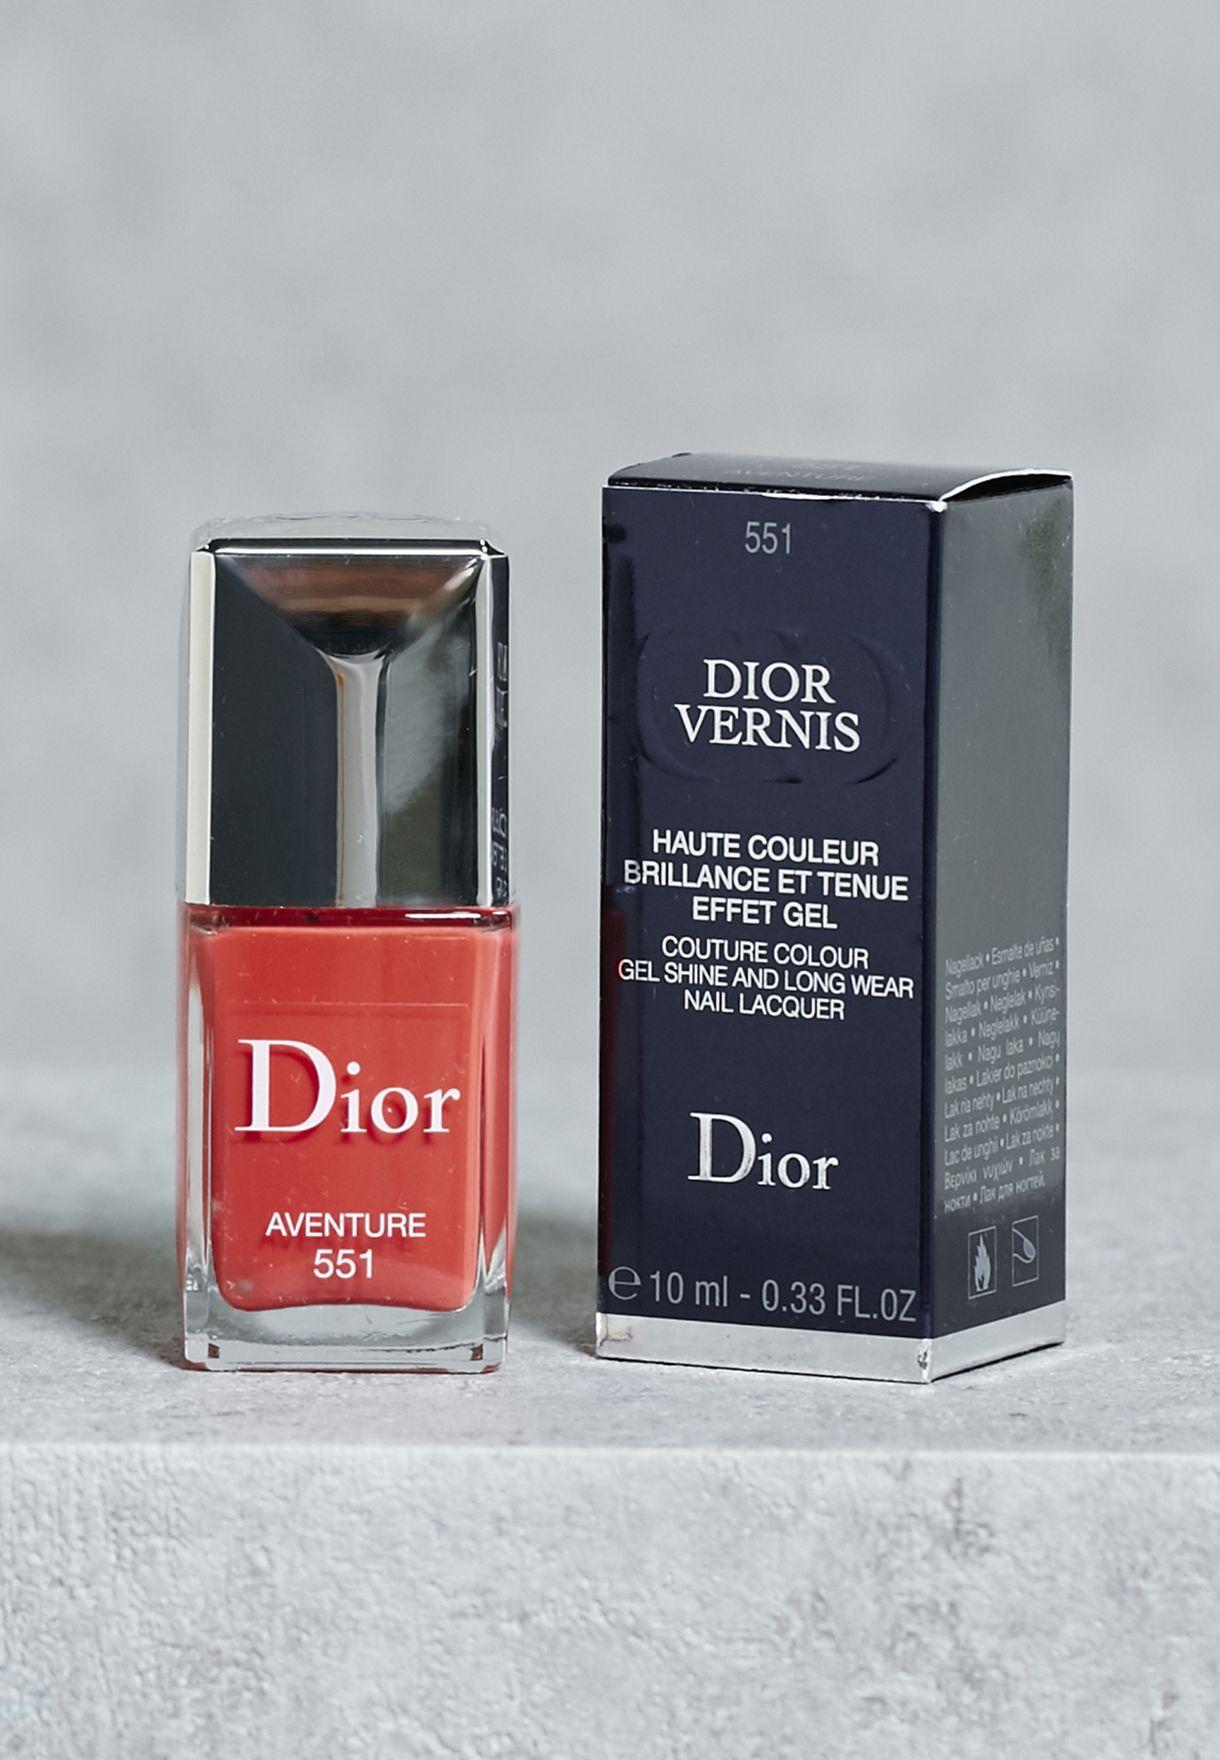 Buy Dior Pink Colour Gel Shine Amp Long Wear Nail Lacquer For Women In Mena Worldwide Globally Di779ac02ykz